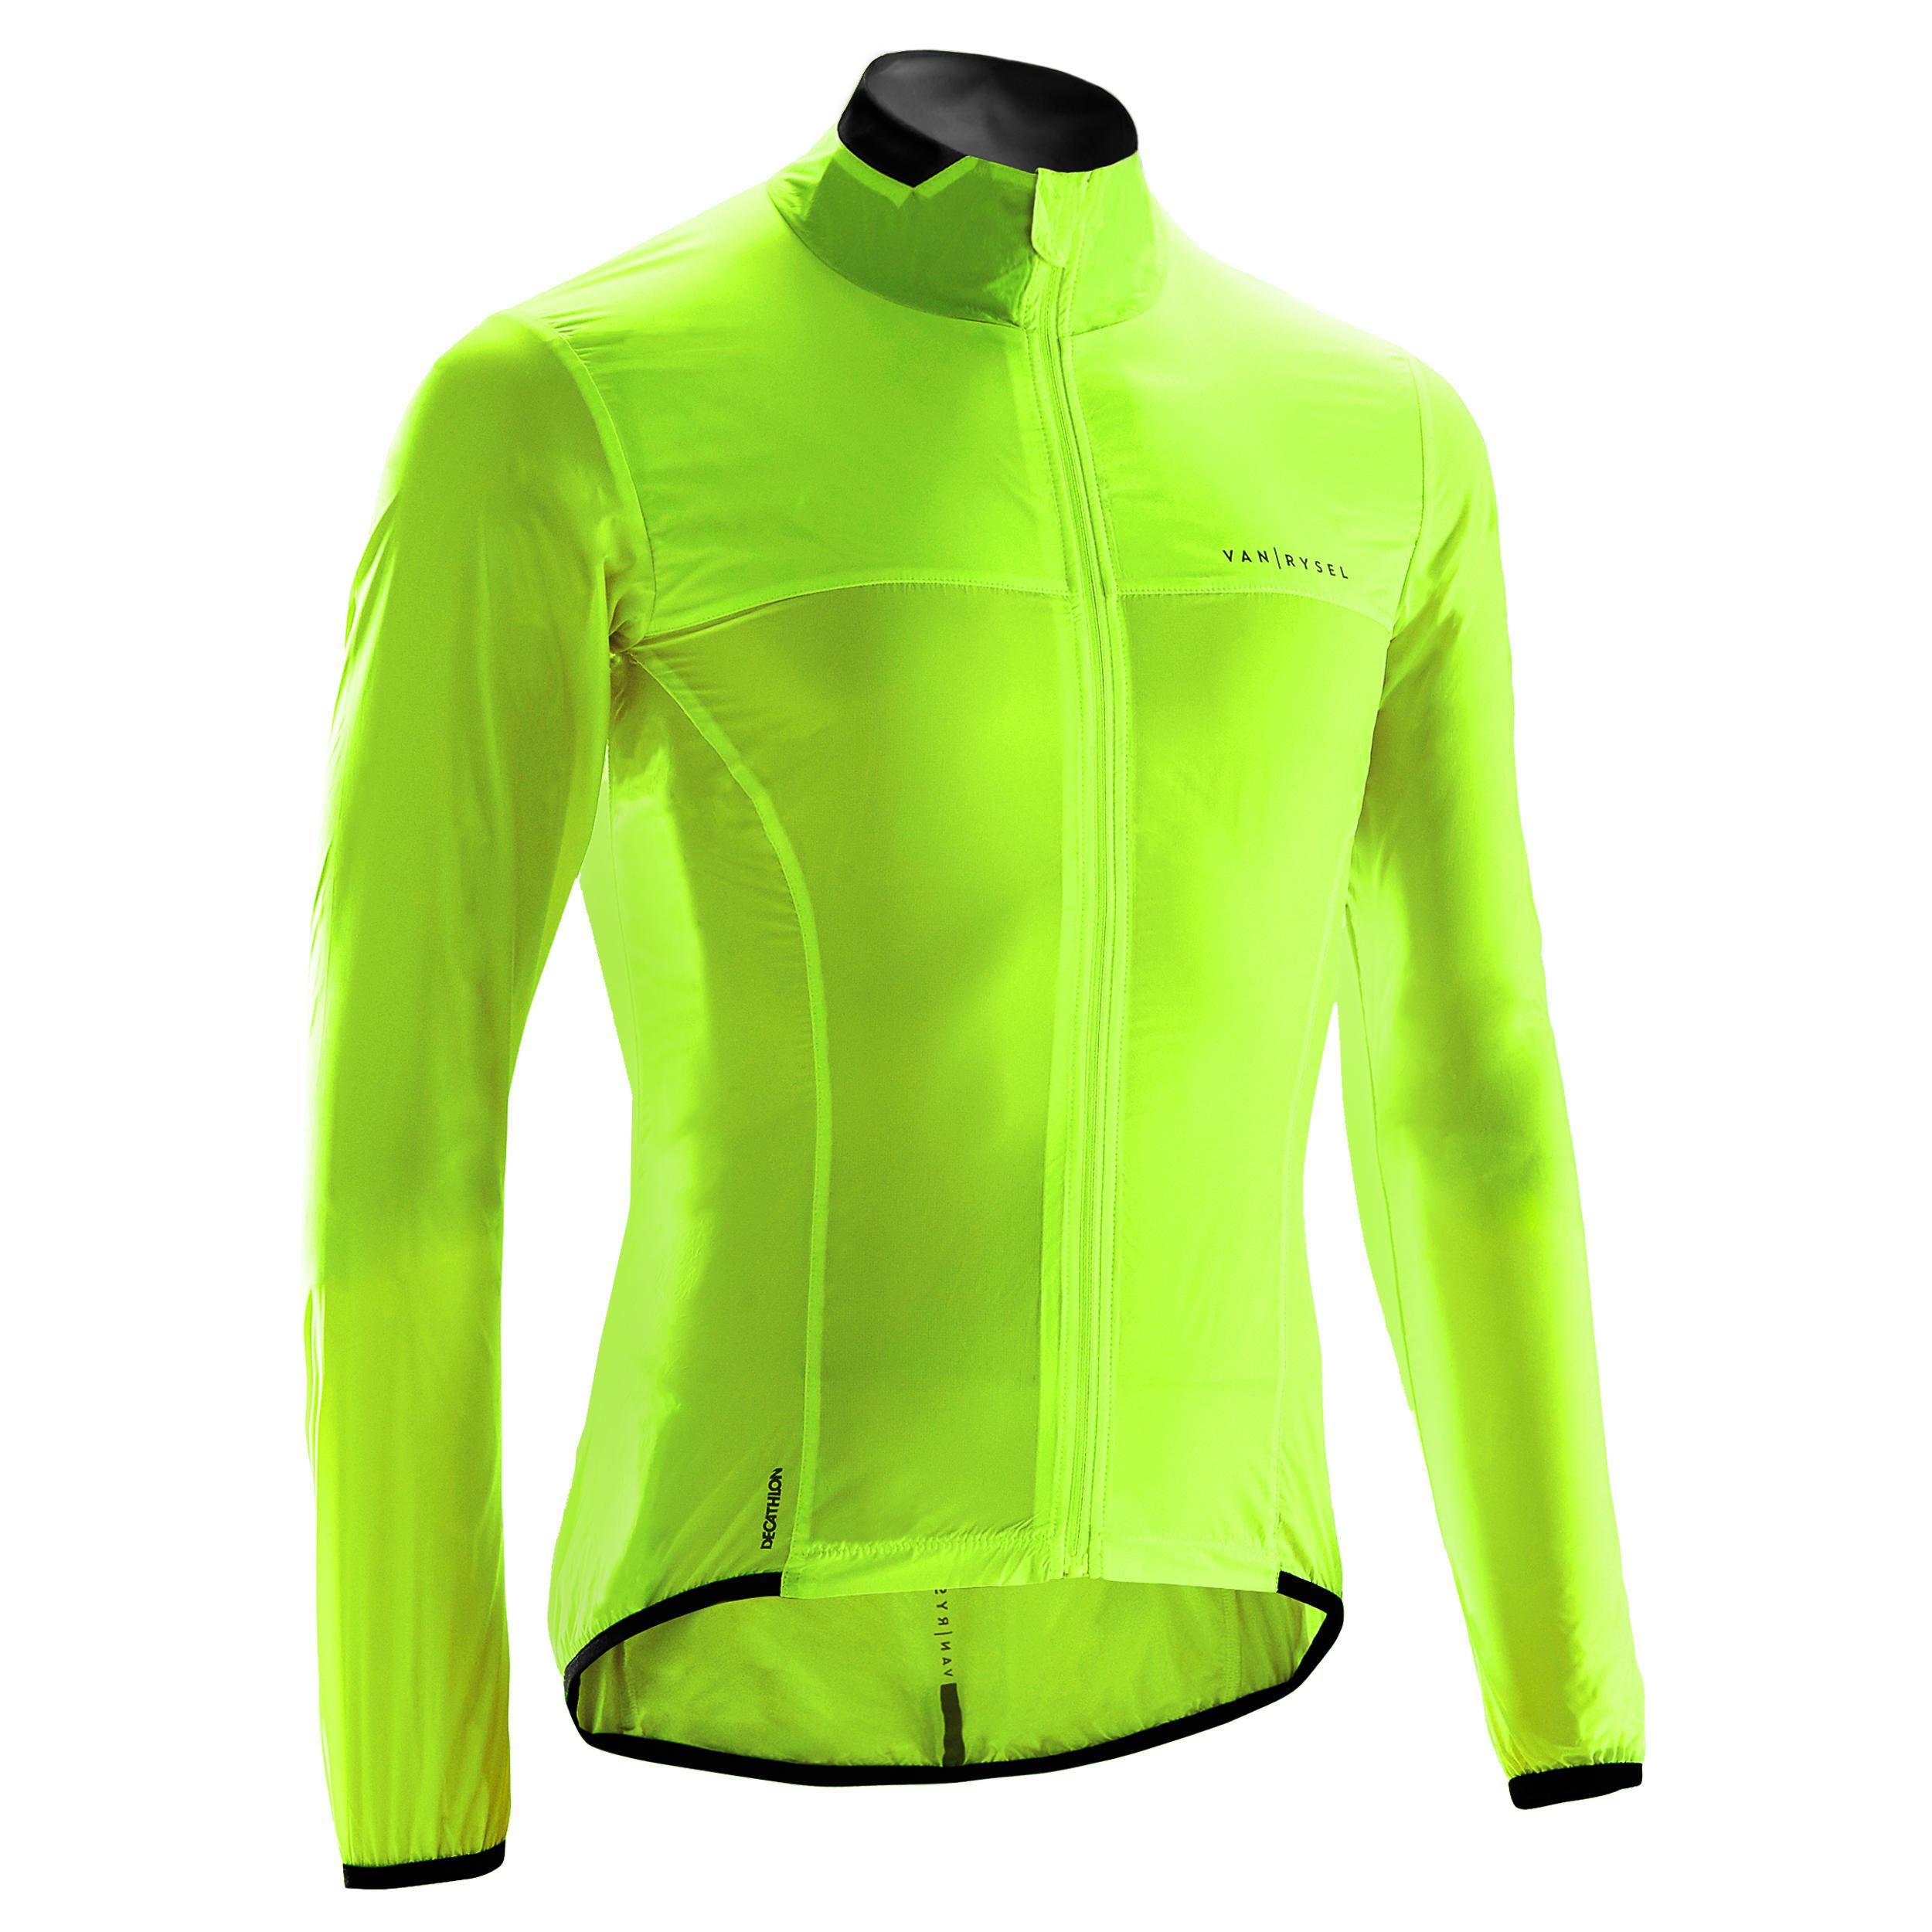 Jachetă Protecţie Vânt RoadR